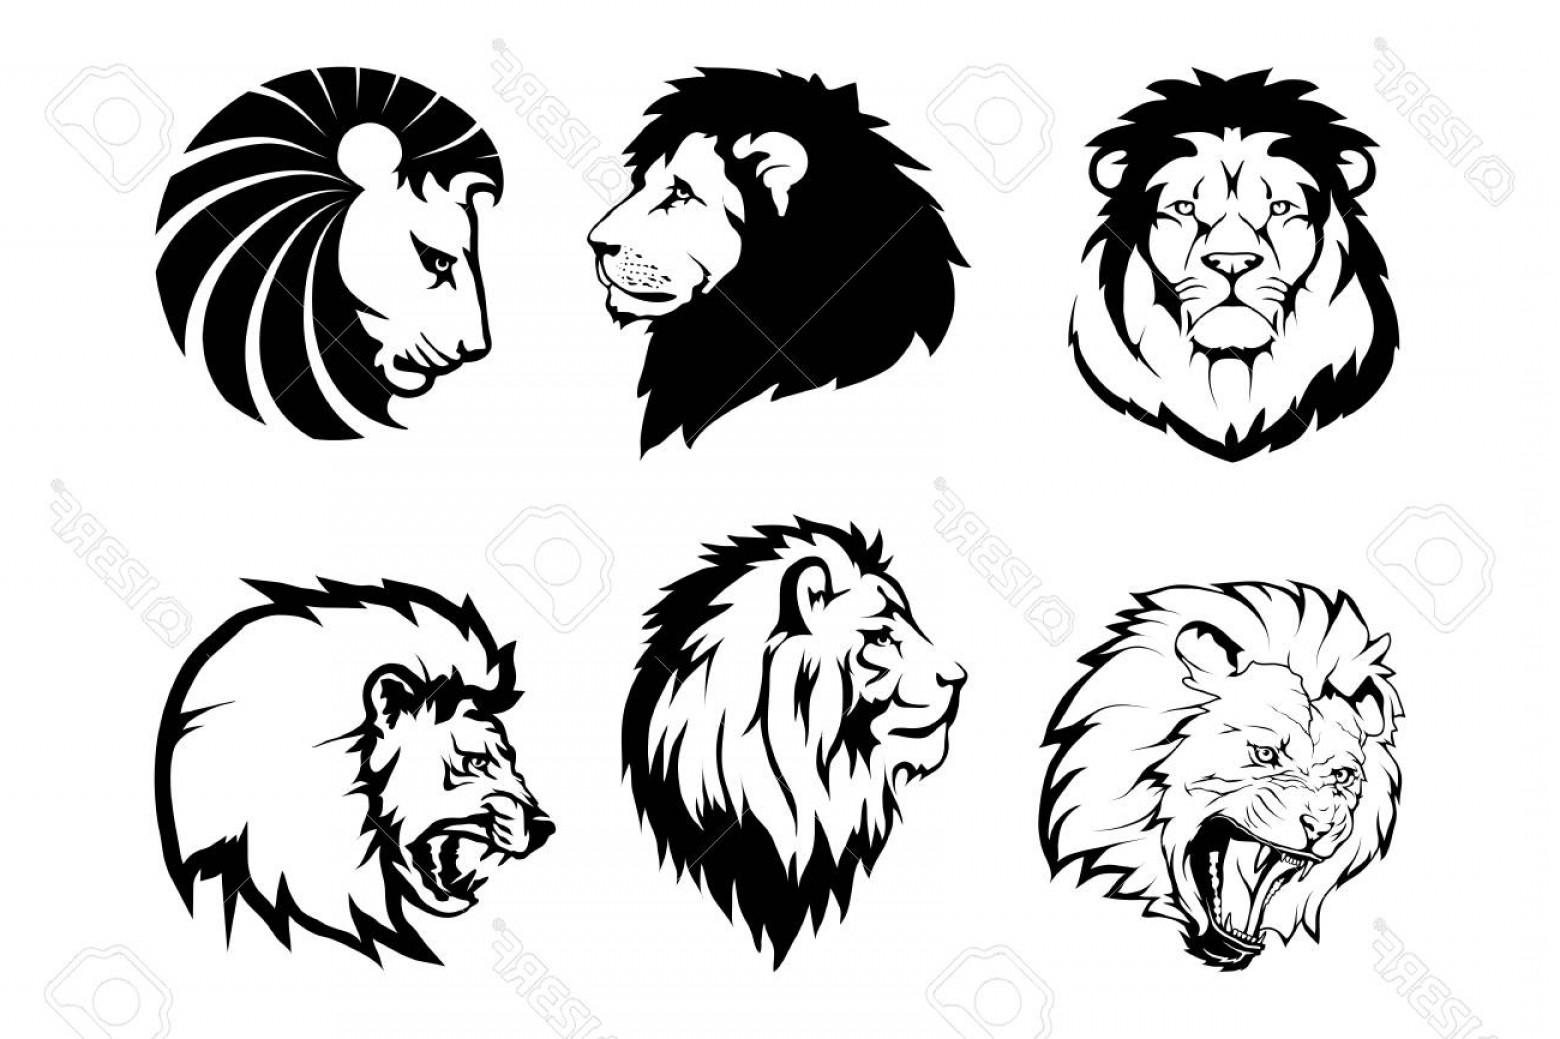 1560x1039 Photostock Vector Lion Logo Vector Animal Lion King Lion Isolated